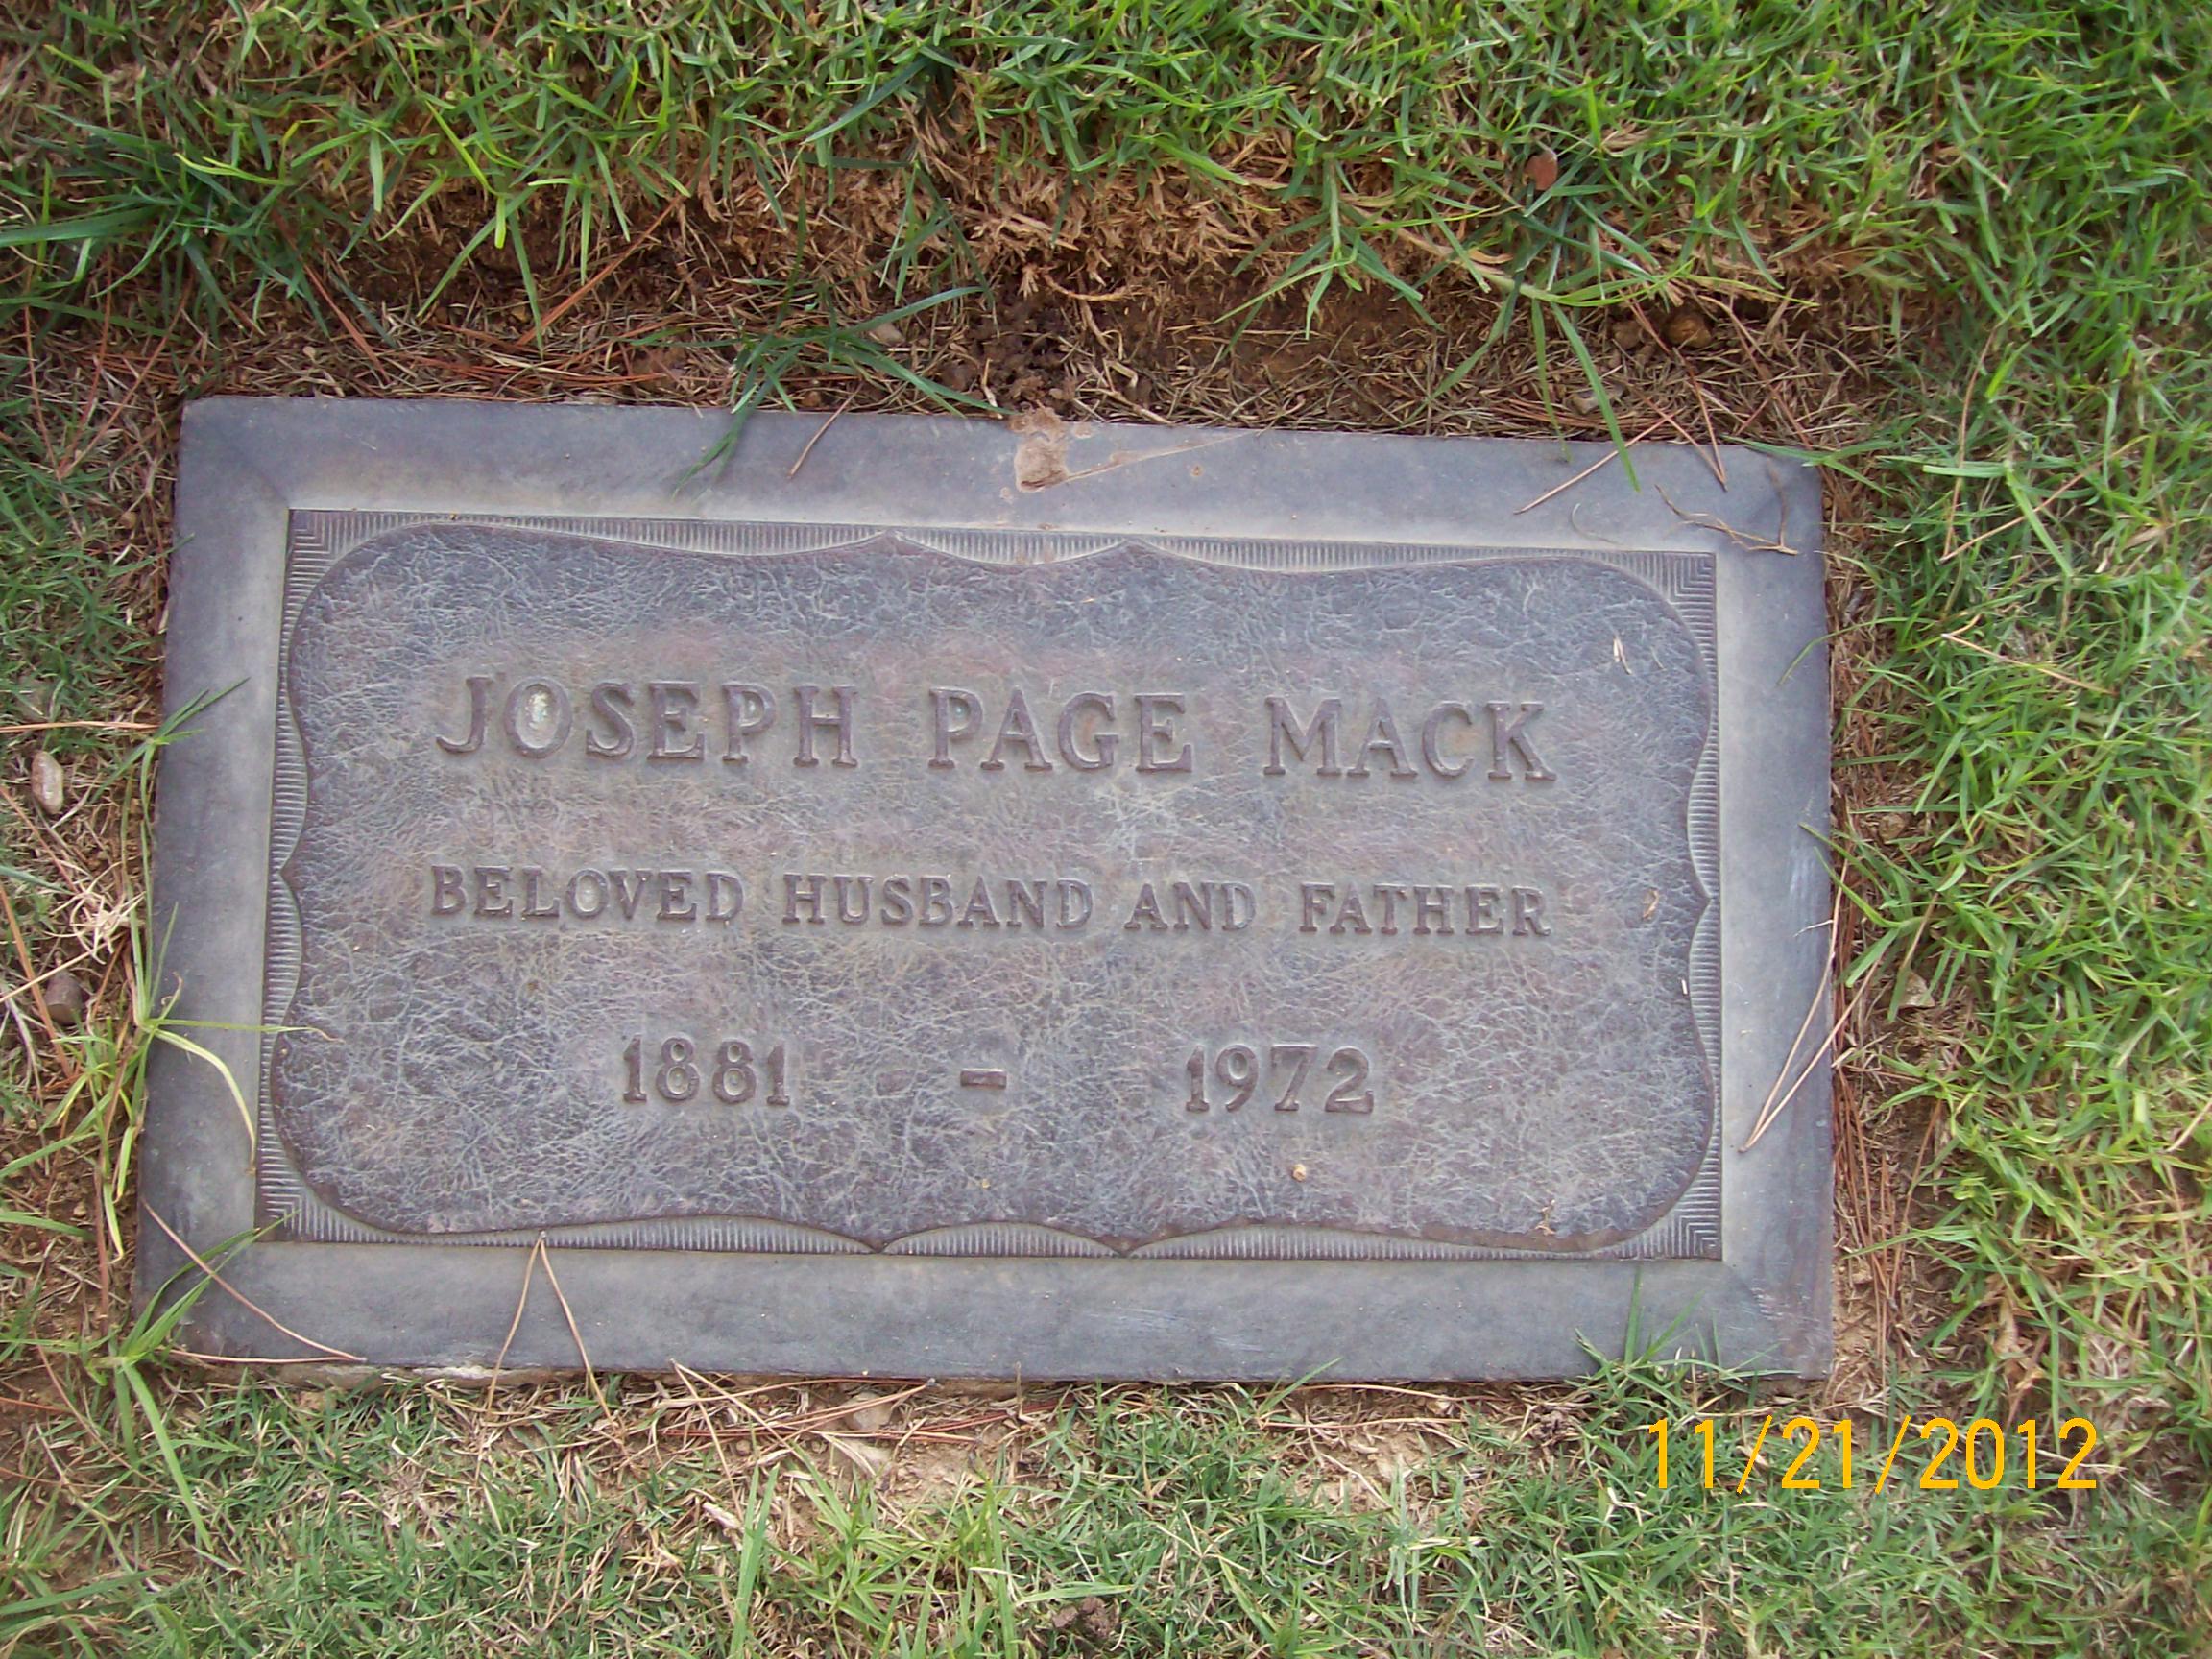 Joseph Page Mack